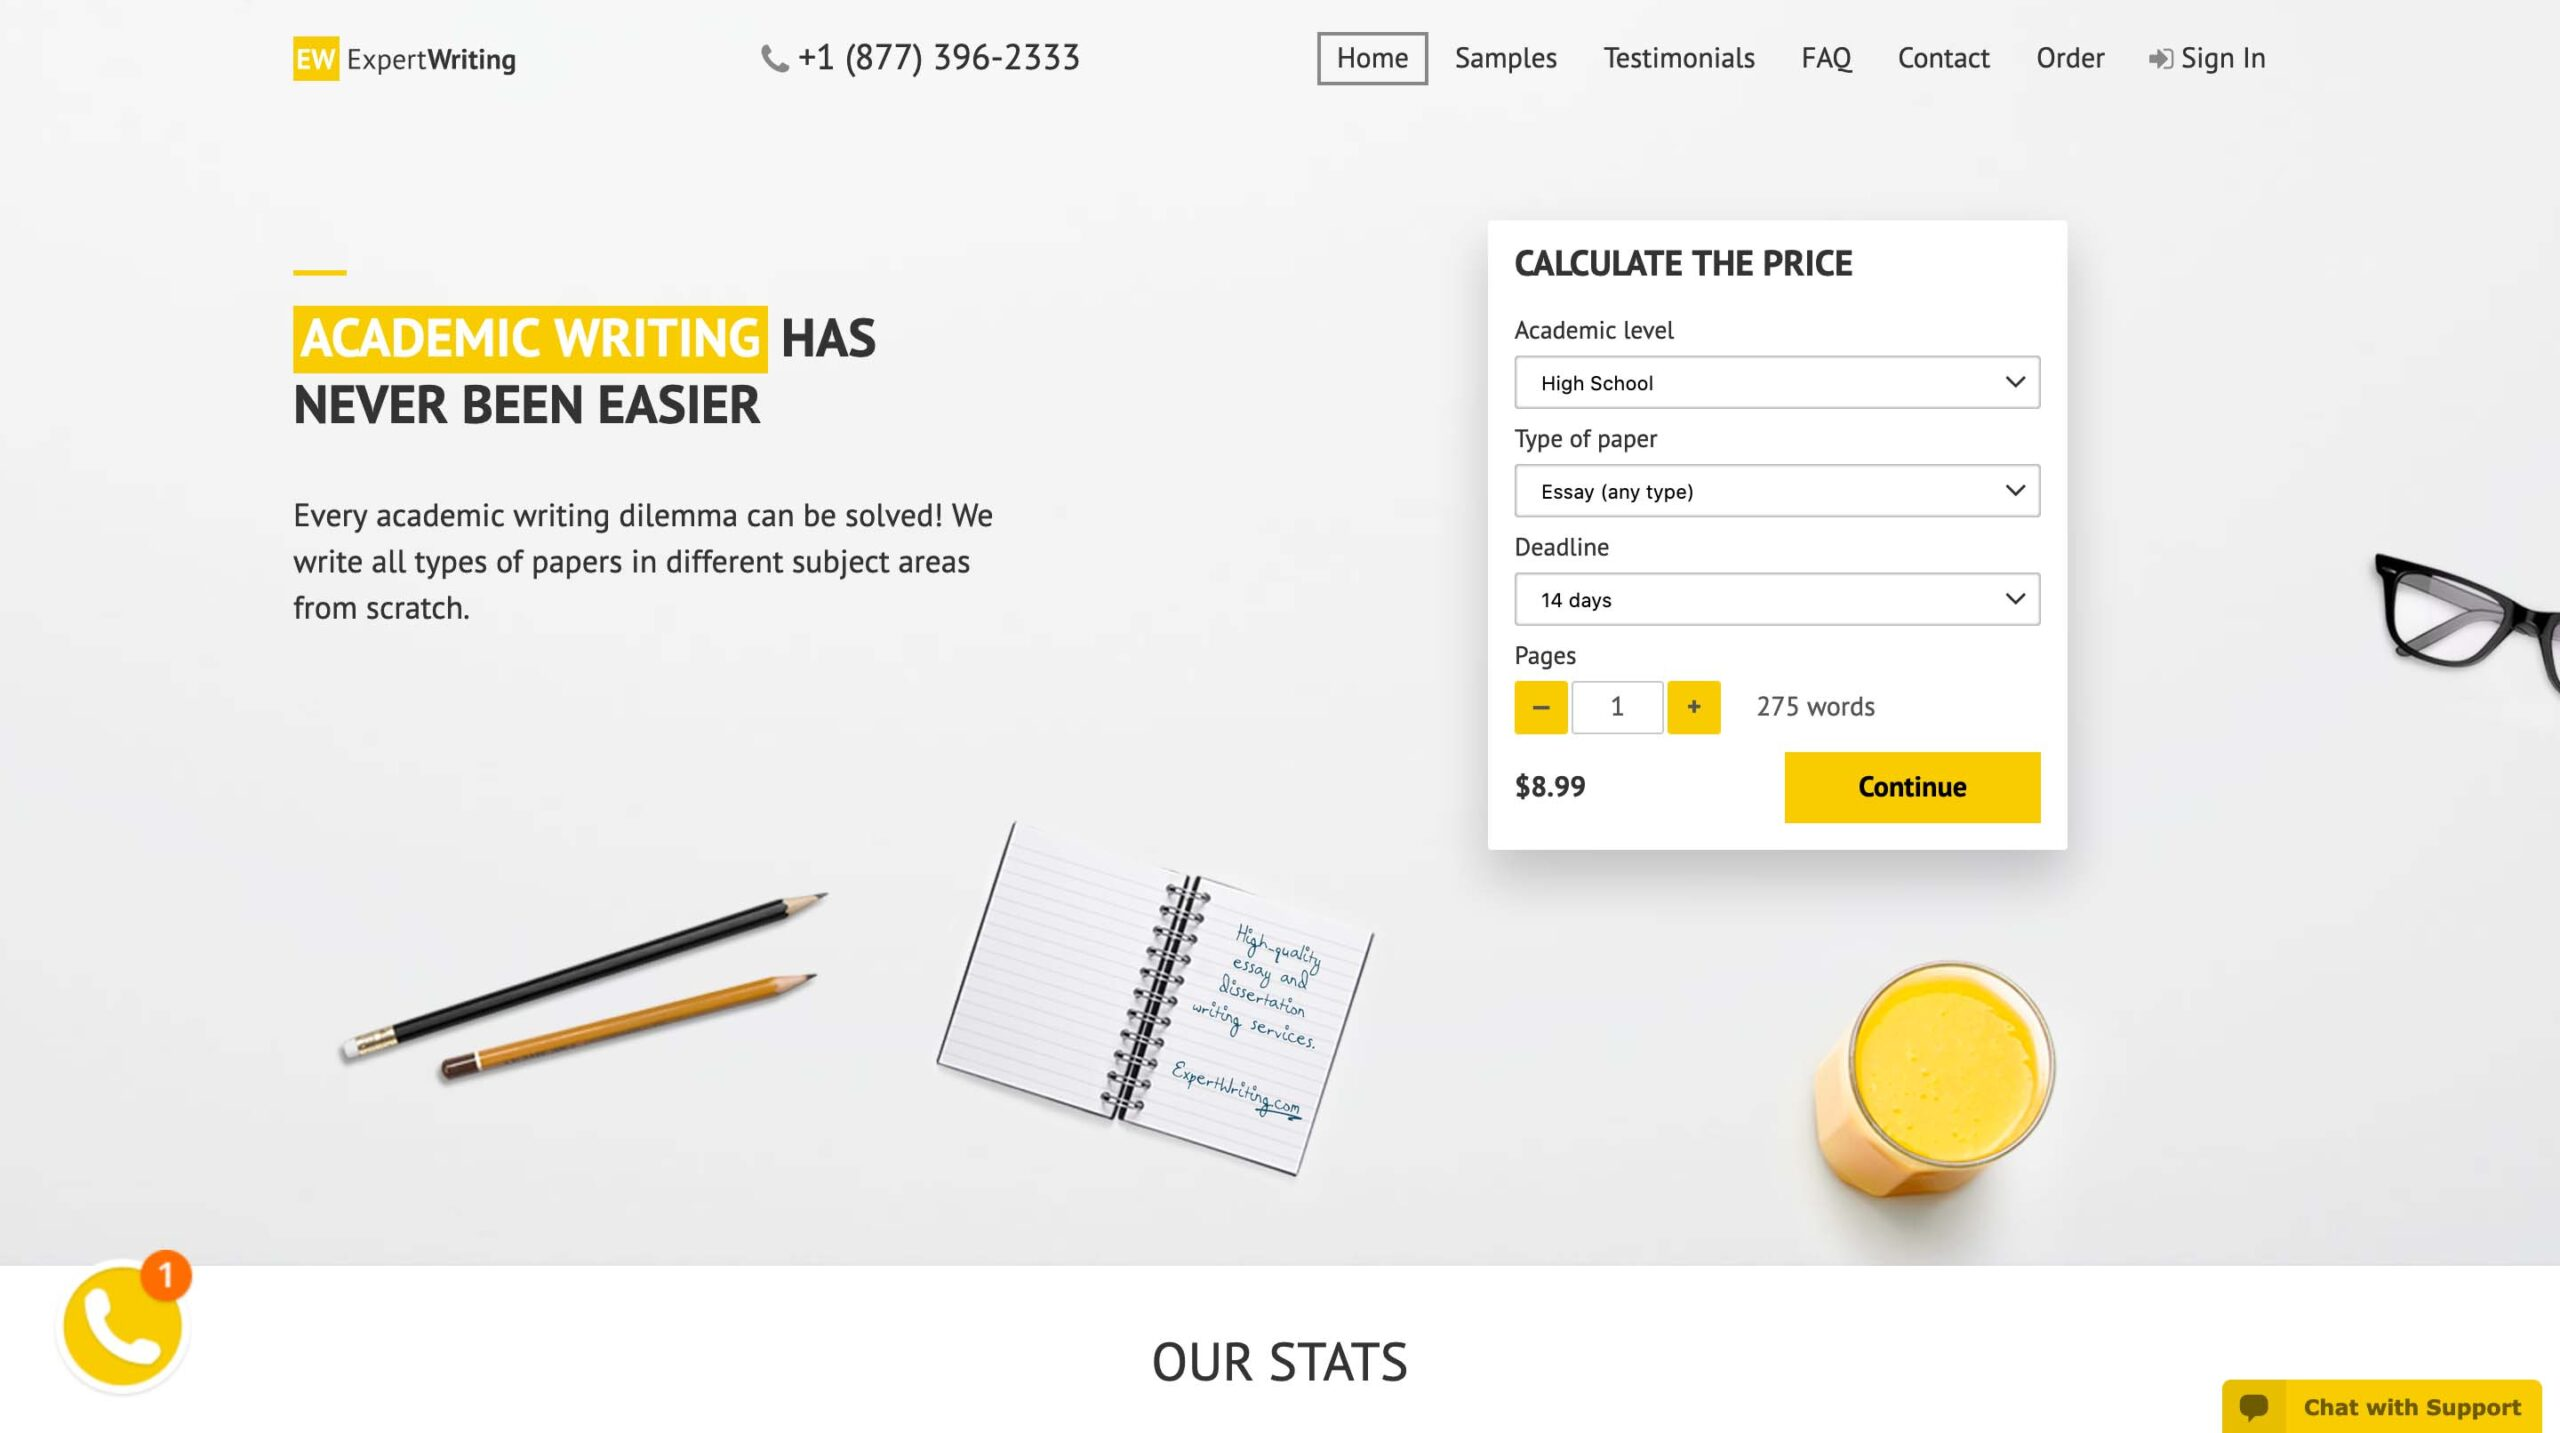 ExpertWriting.org website